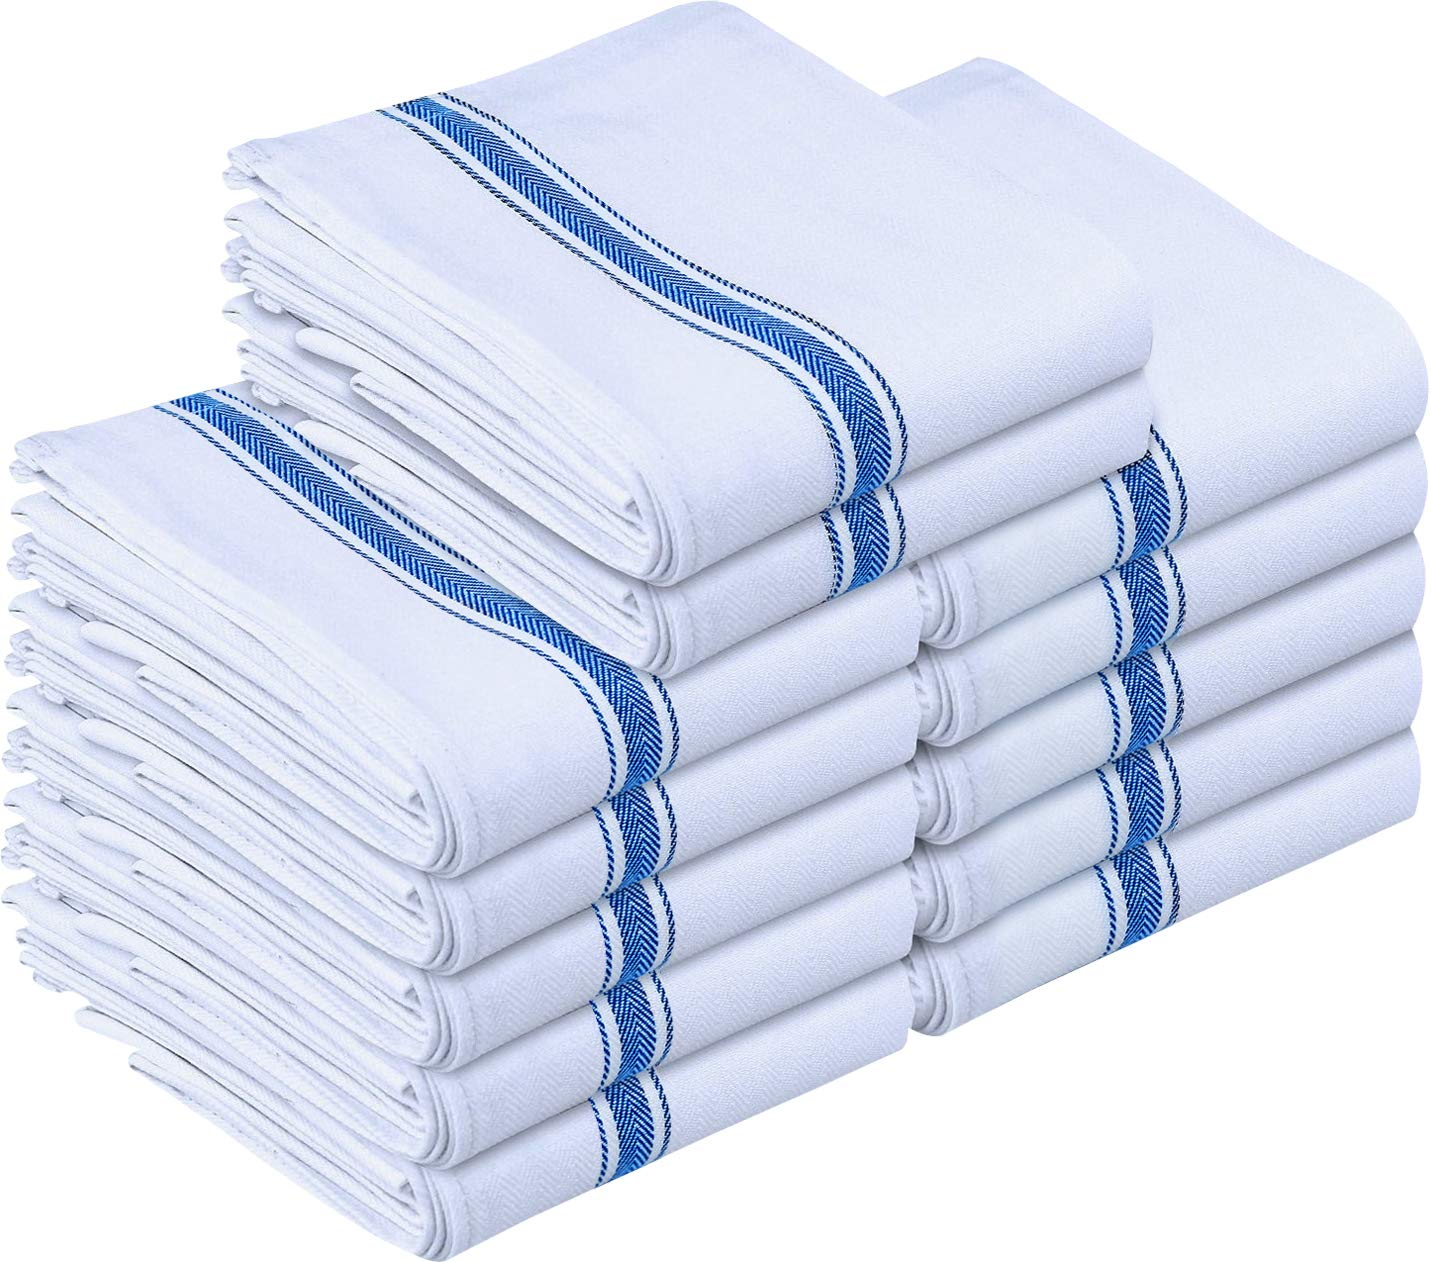 Utopia Towels Kitchen Towels - Dish Cloth (12 Pack) - Machine Washable Cotton White Kitchen Dishcloths, Dish Towel & Tea Towels (15 x 25 Inch) (Blue)